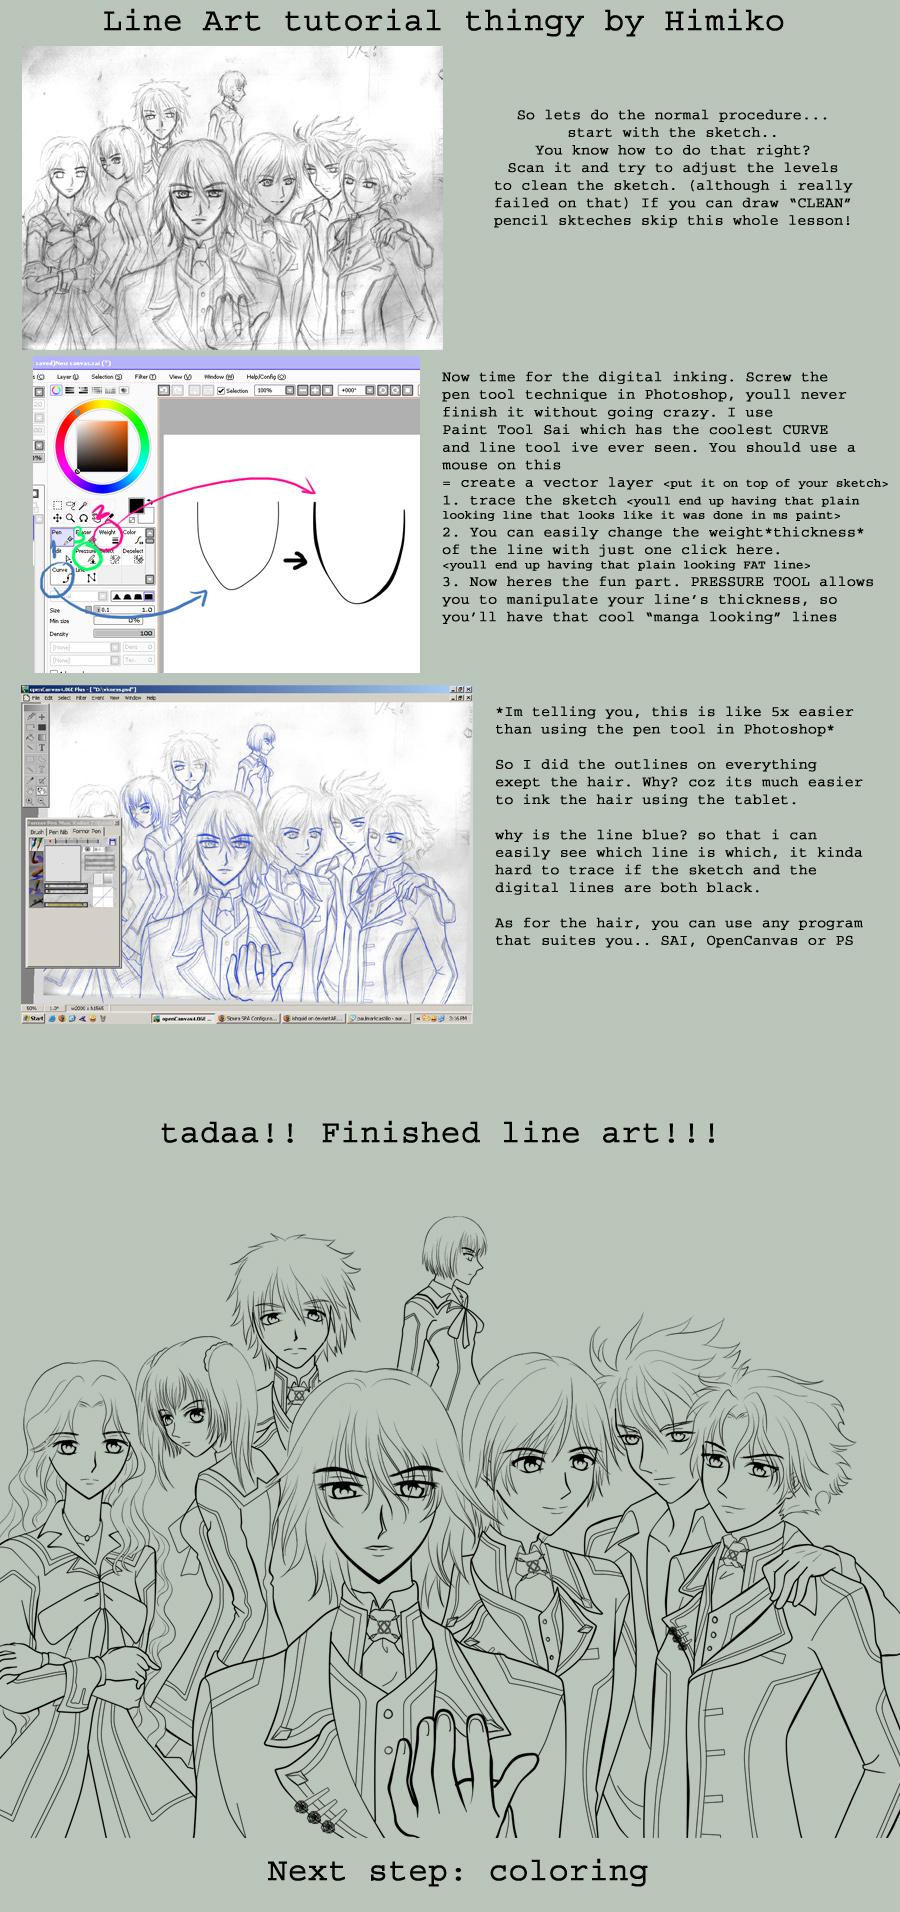 Line Art Tutorial Photo : Line art tutorial in sai by himiko on deviantart